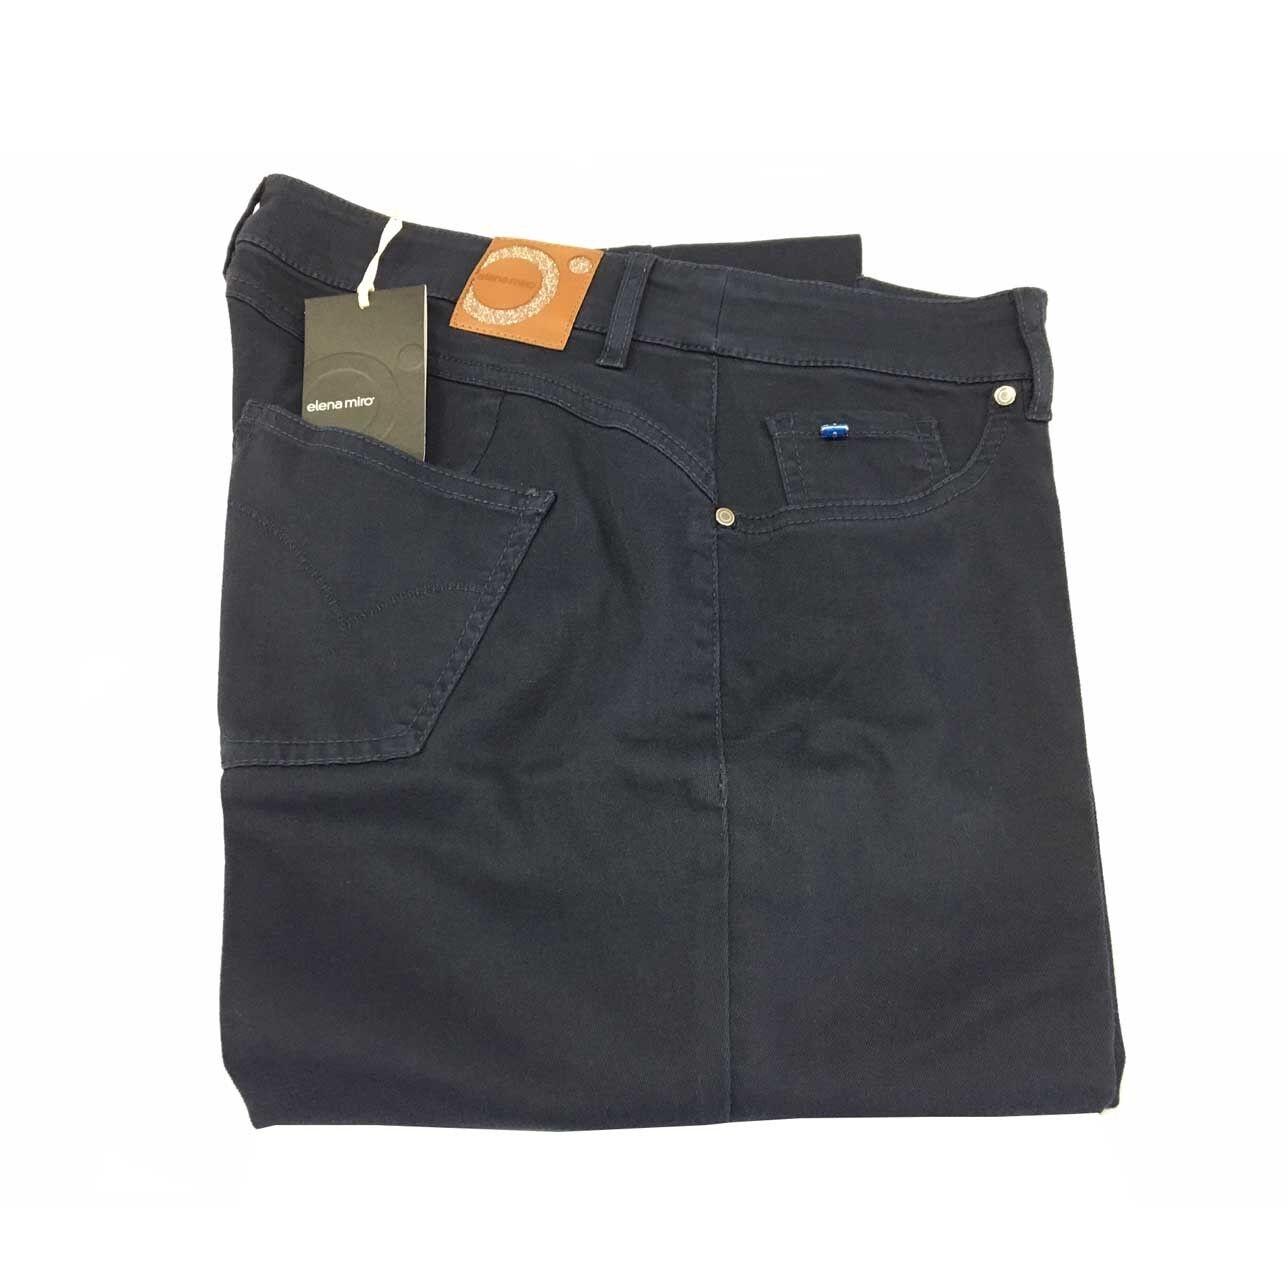 ELENA MIRO' women's trousers mod bluee jeans light cotton 89%